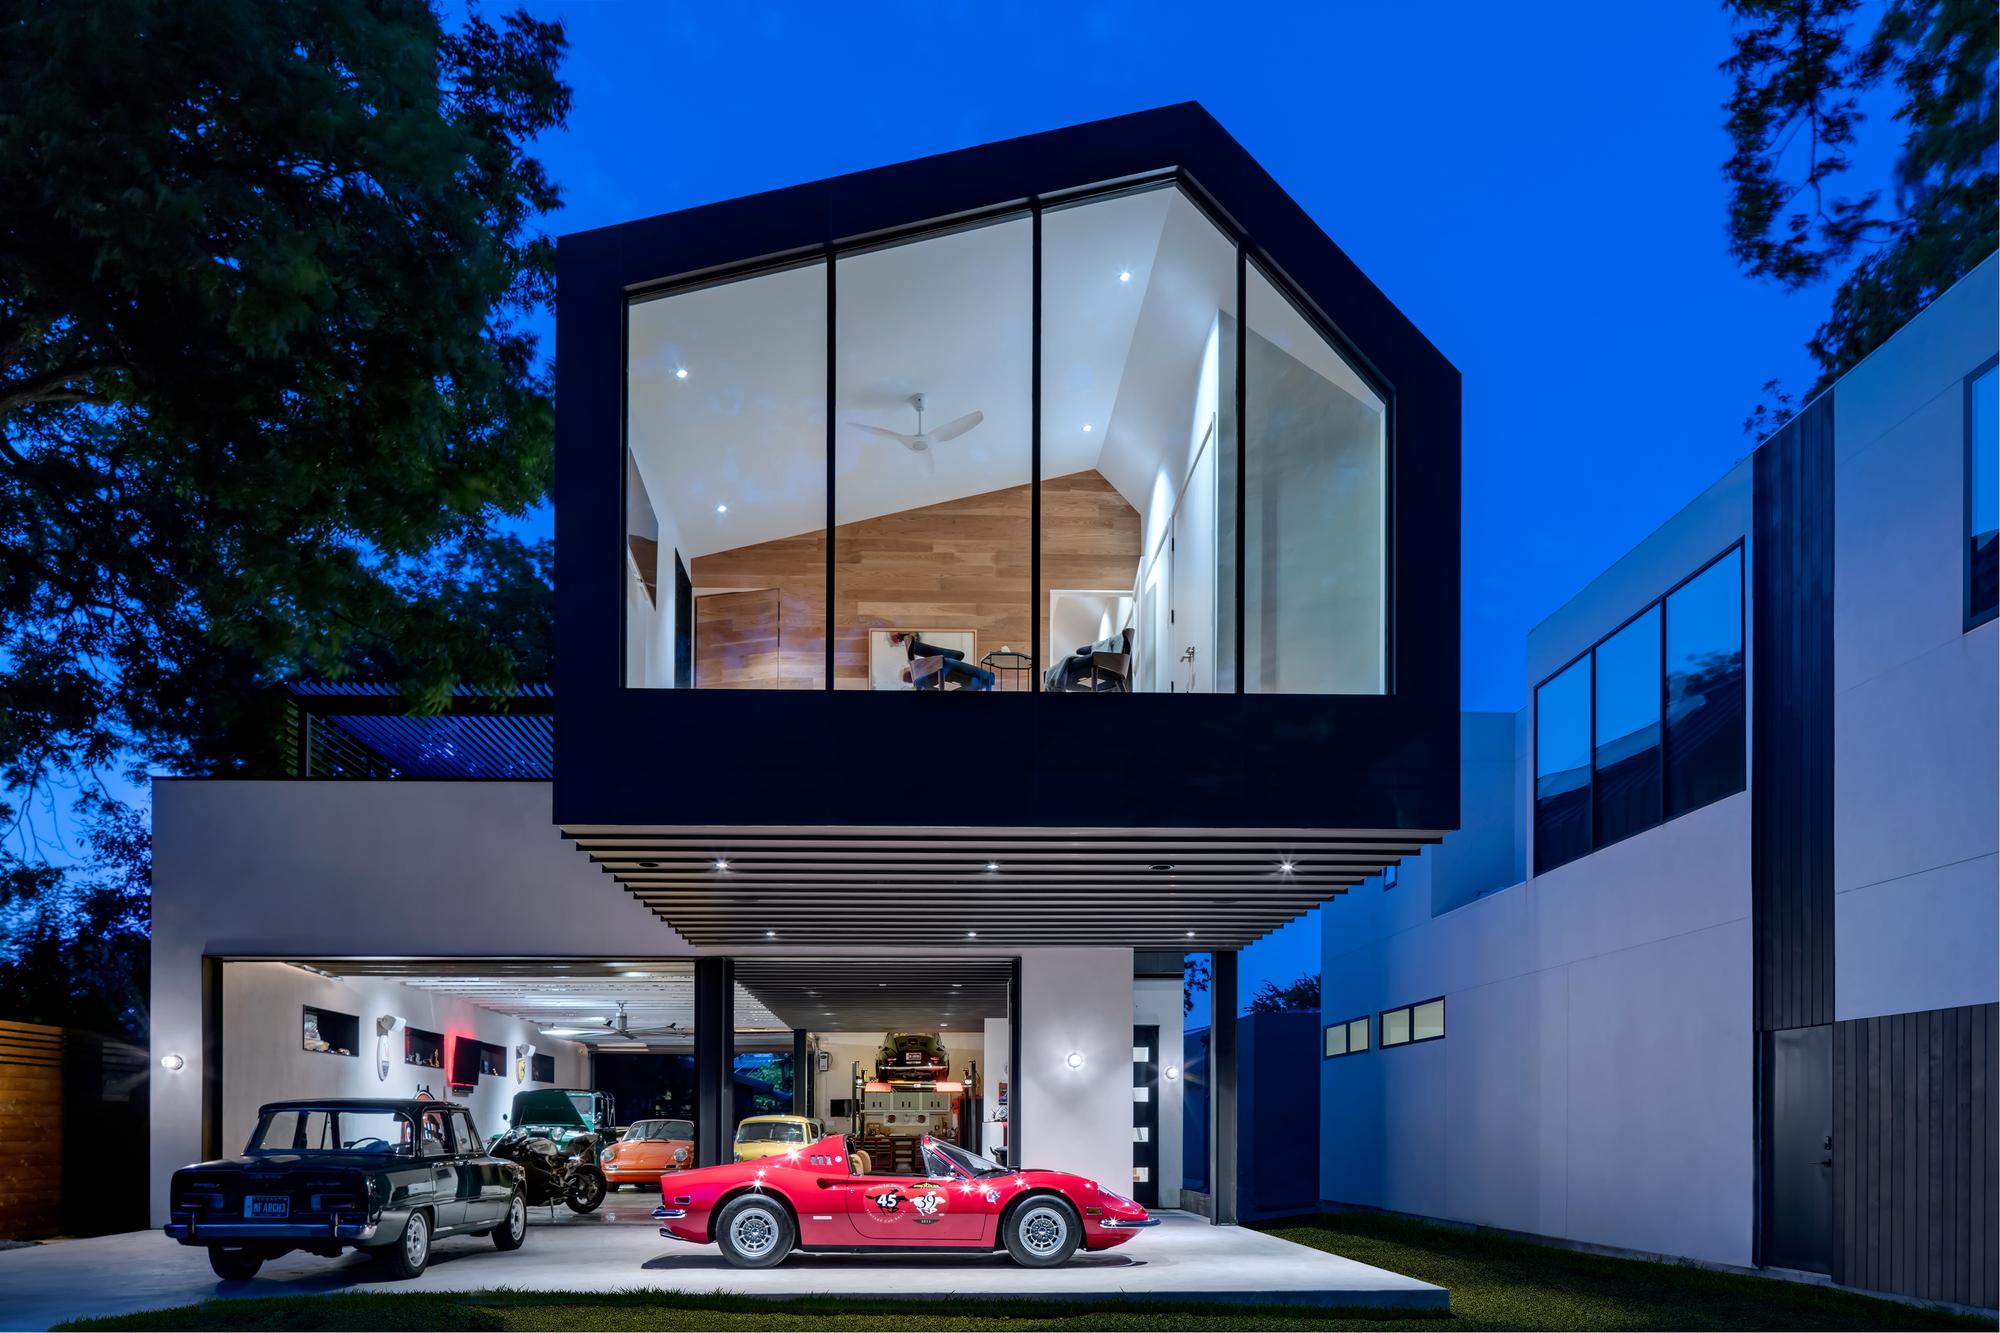 Gallery of autohaus matt fajkus architecture 19 for Home node b architecture